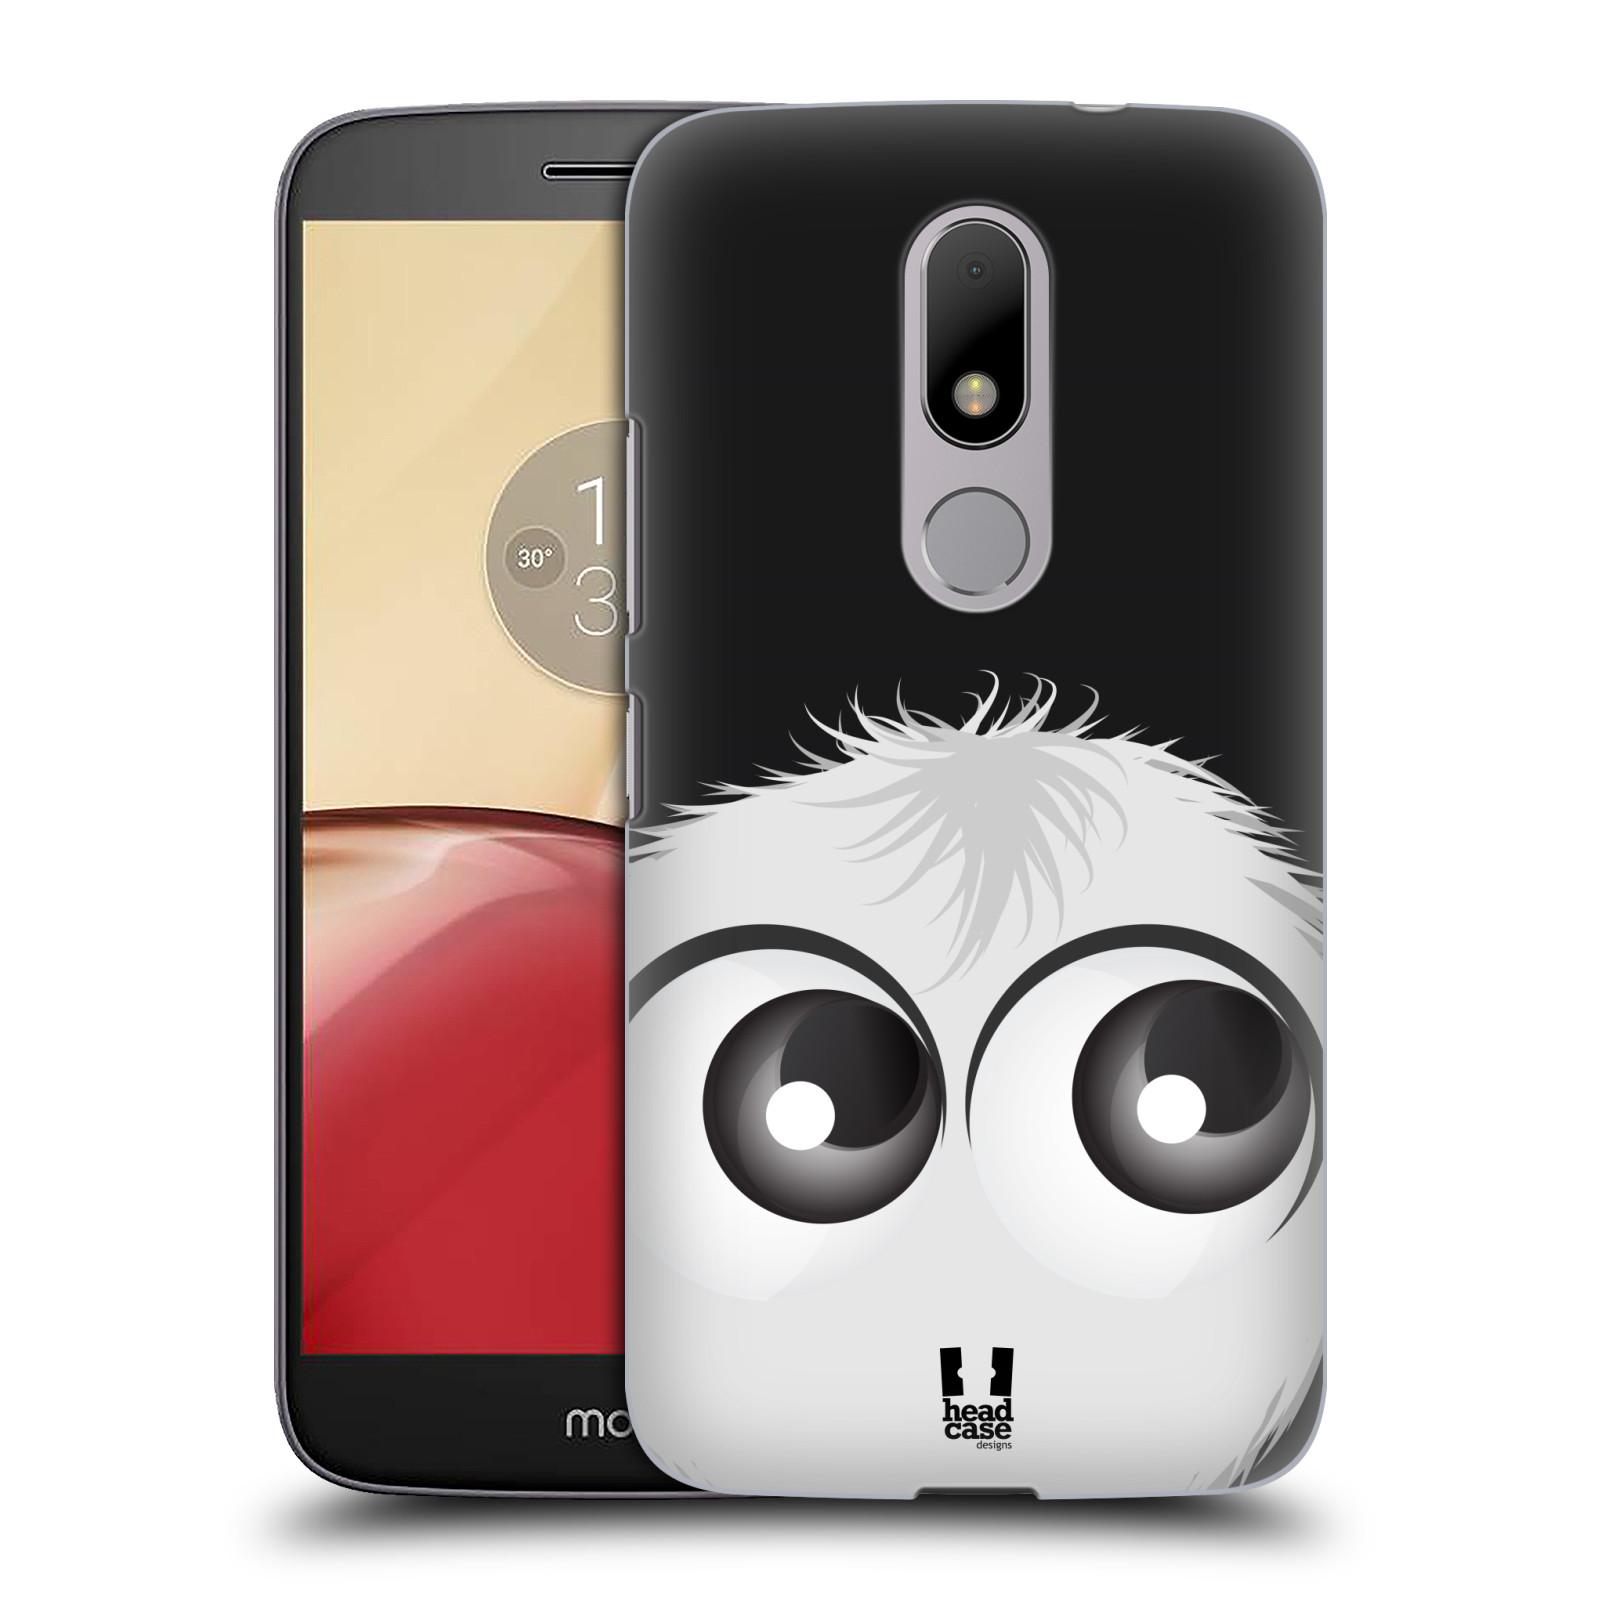 Plastové pouzdro na mobil Lenovo Moto M HEAD CASE FUZÍK BÍLÝ (Plastový kryt či obal na mobilní telefon Lenovo (Motorola) Moto M / Moto M Dual SIM)